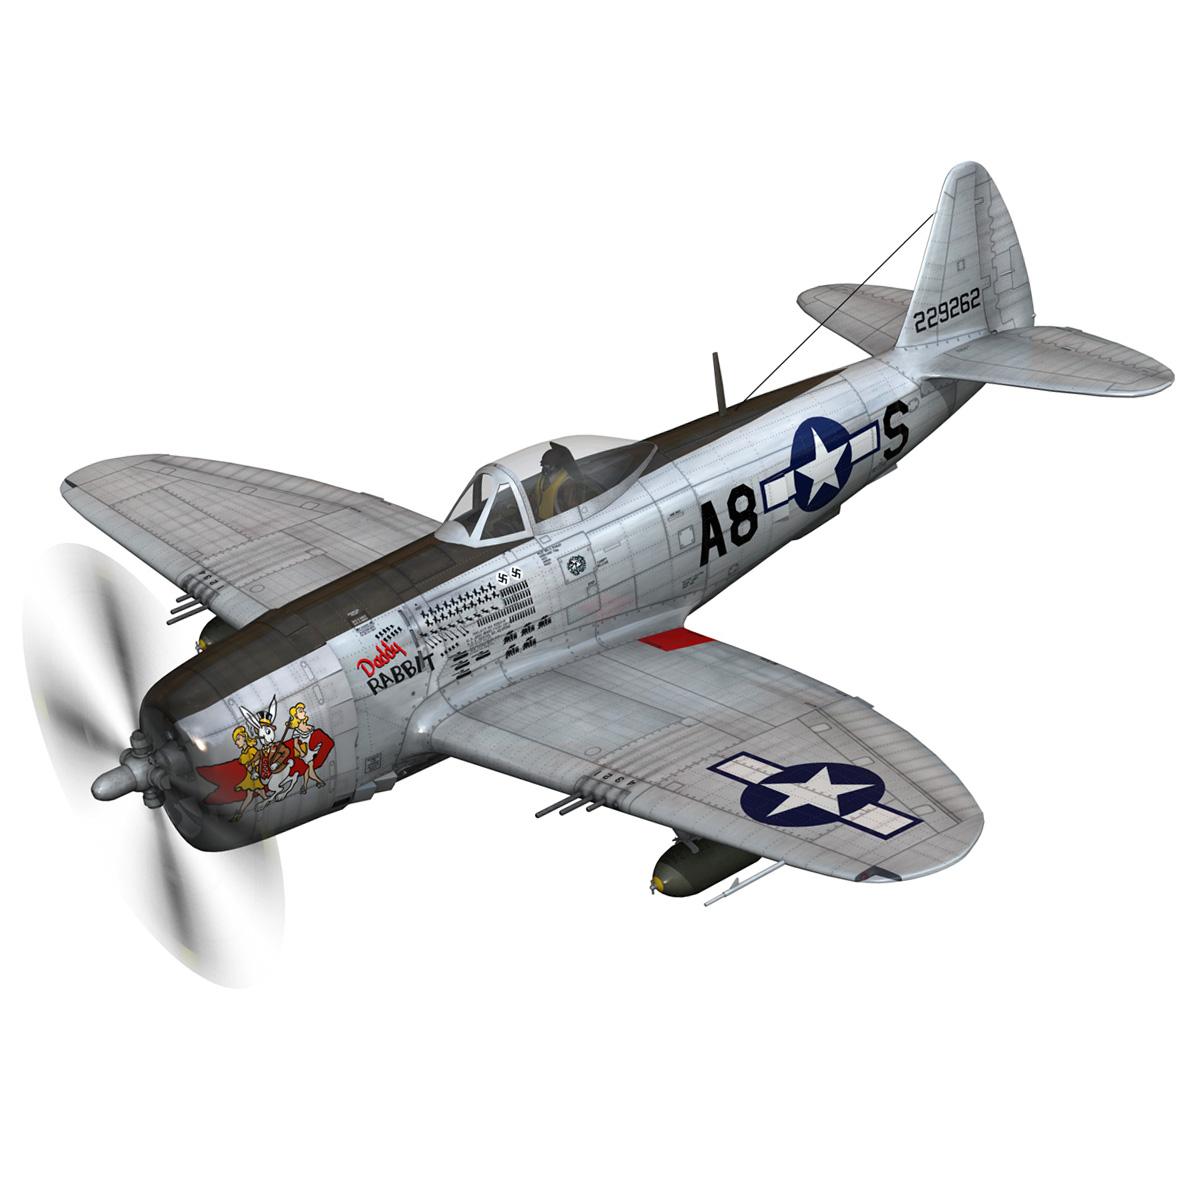 republic p-47 thunderbolt – daddy rabbit 3d model fbx c4d lwo obj 272691